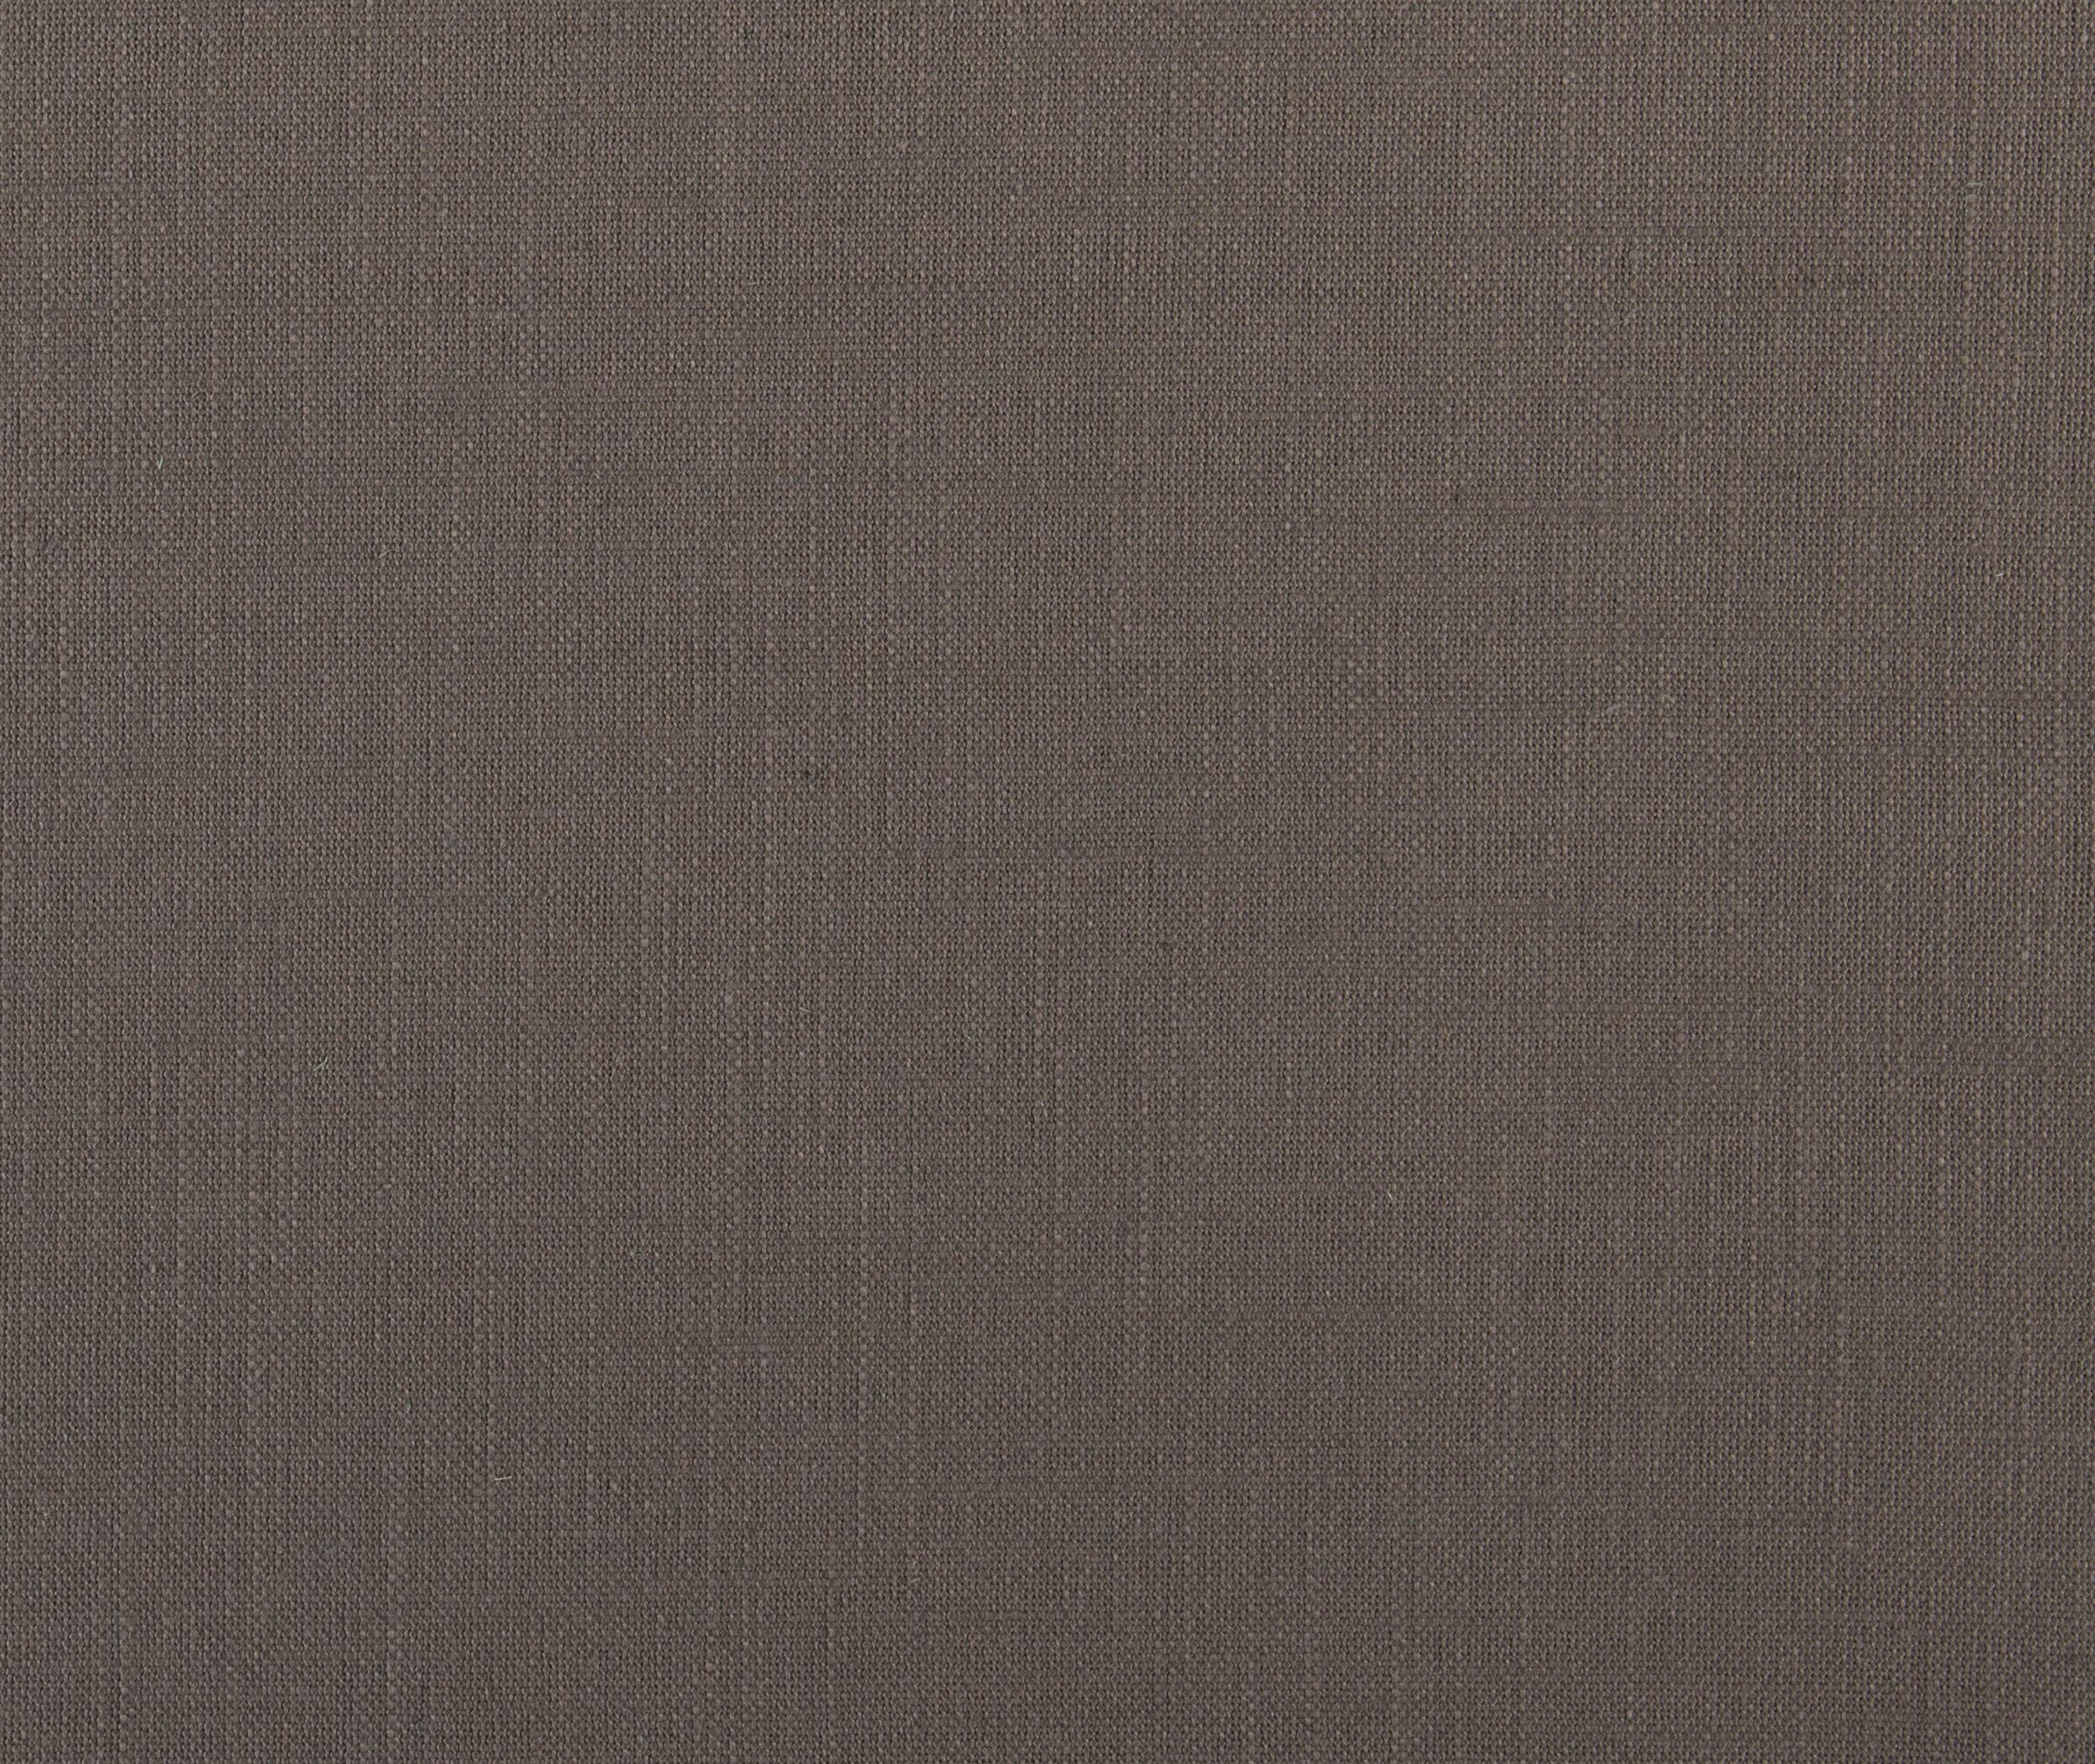 Brown-Gray